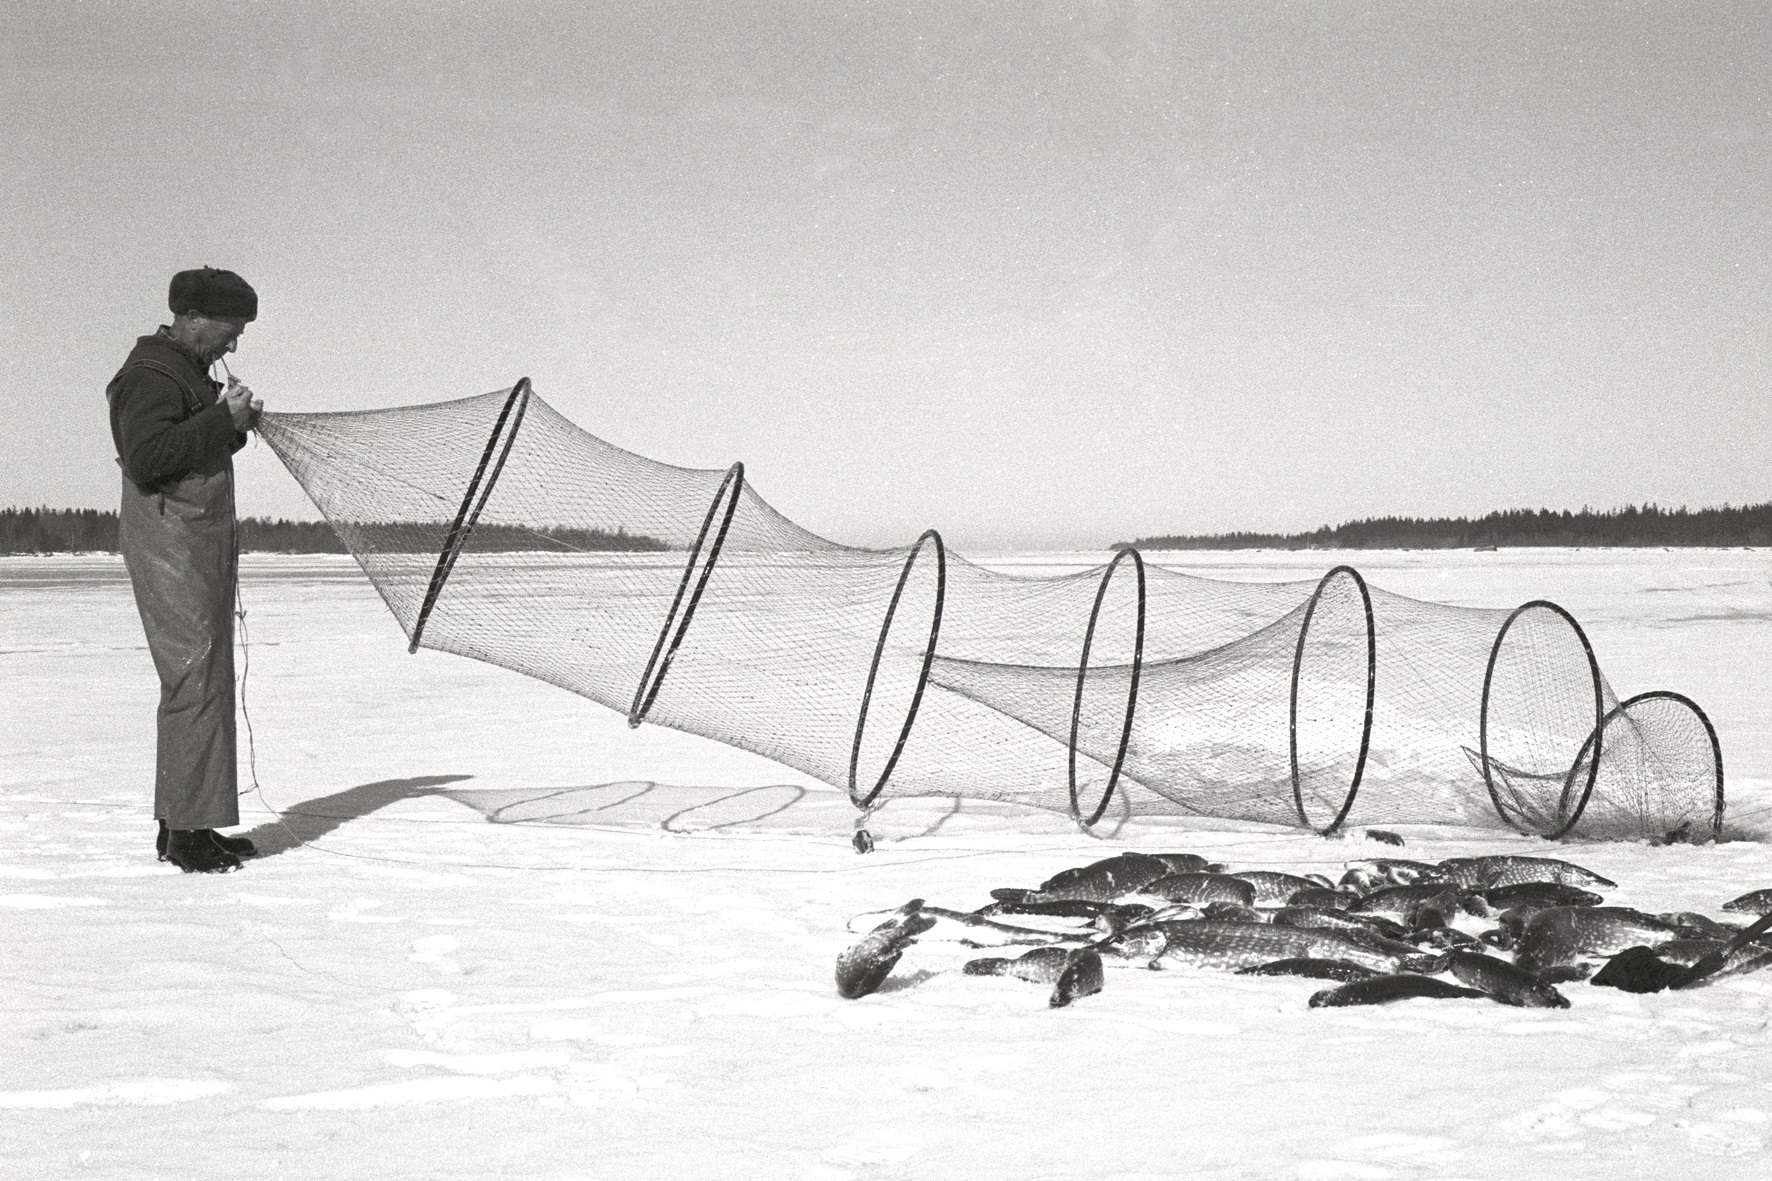 Fishing pike with fyke net.